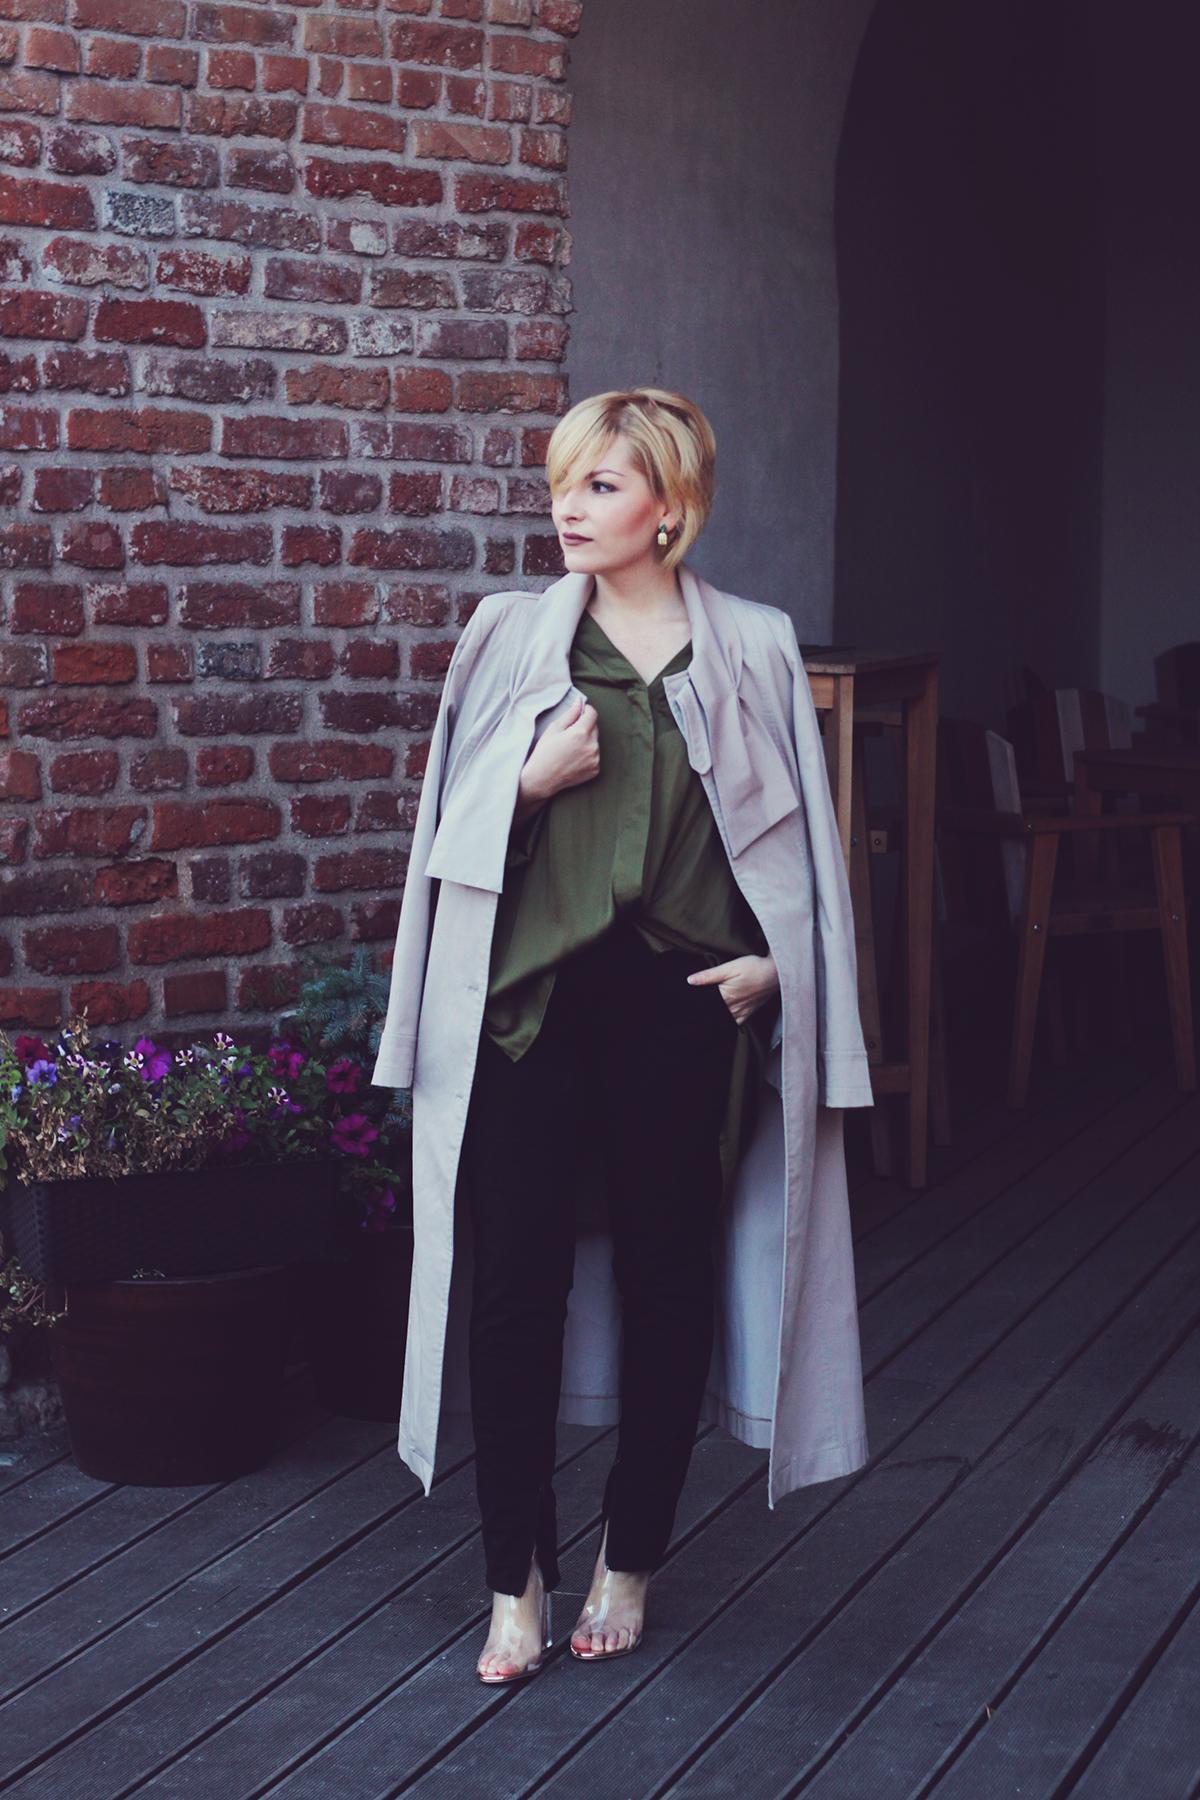 rosegal clear transparent boots, stella mccartney pants, long trench coat, green loose top, rosegal earrings